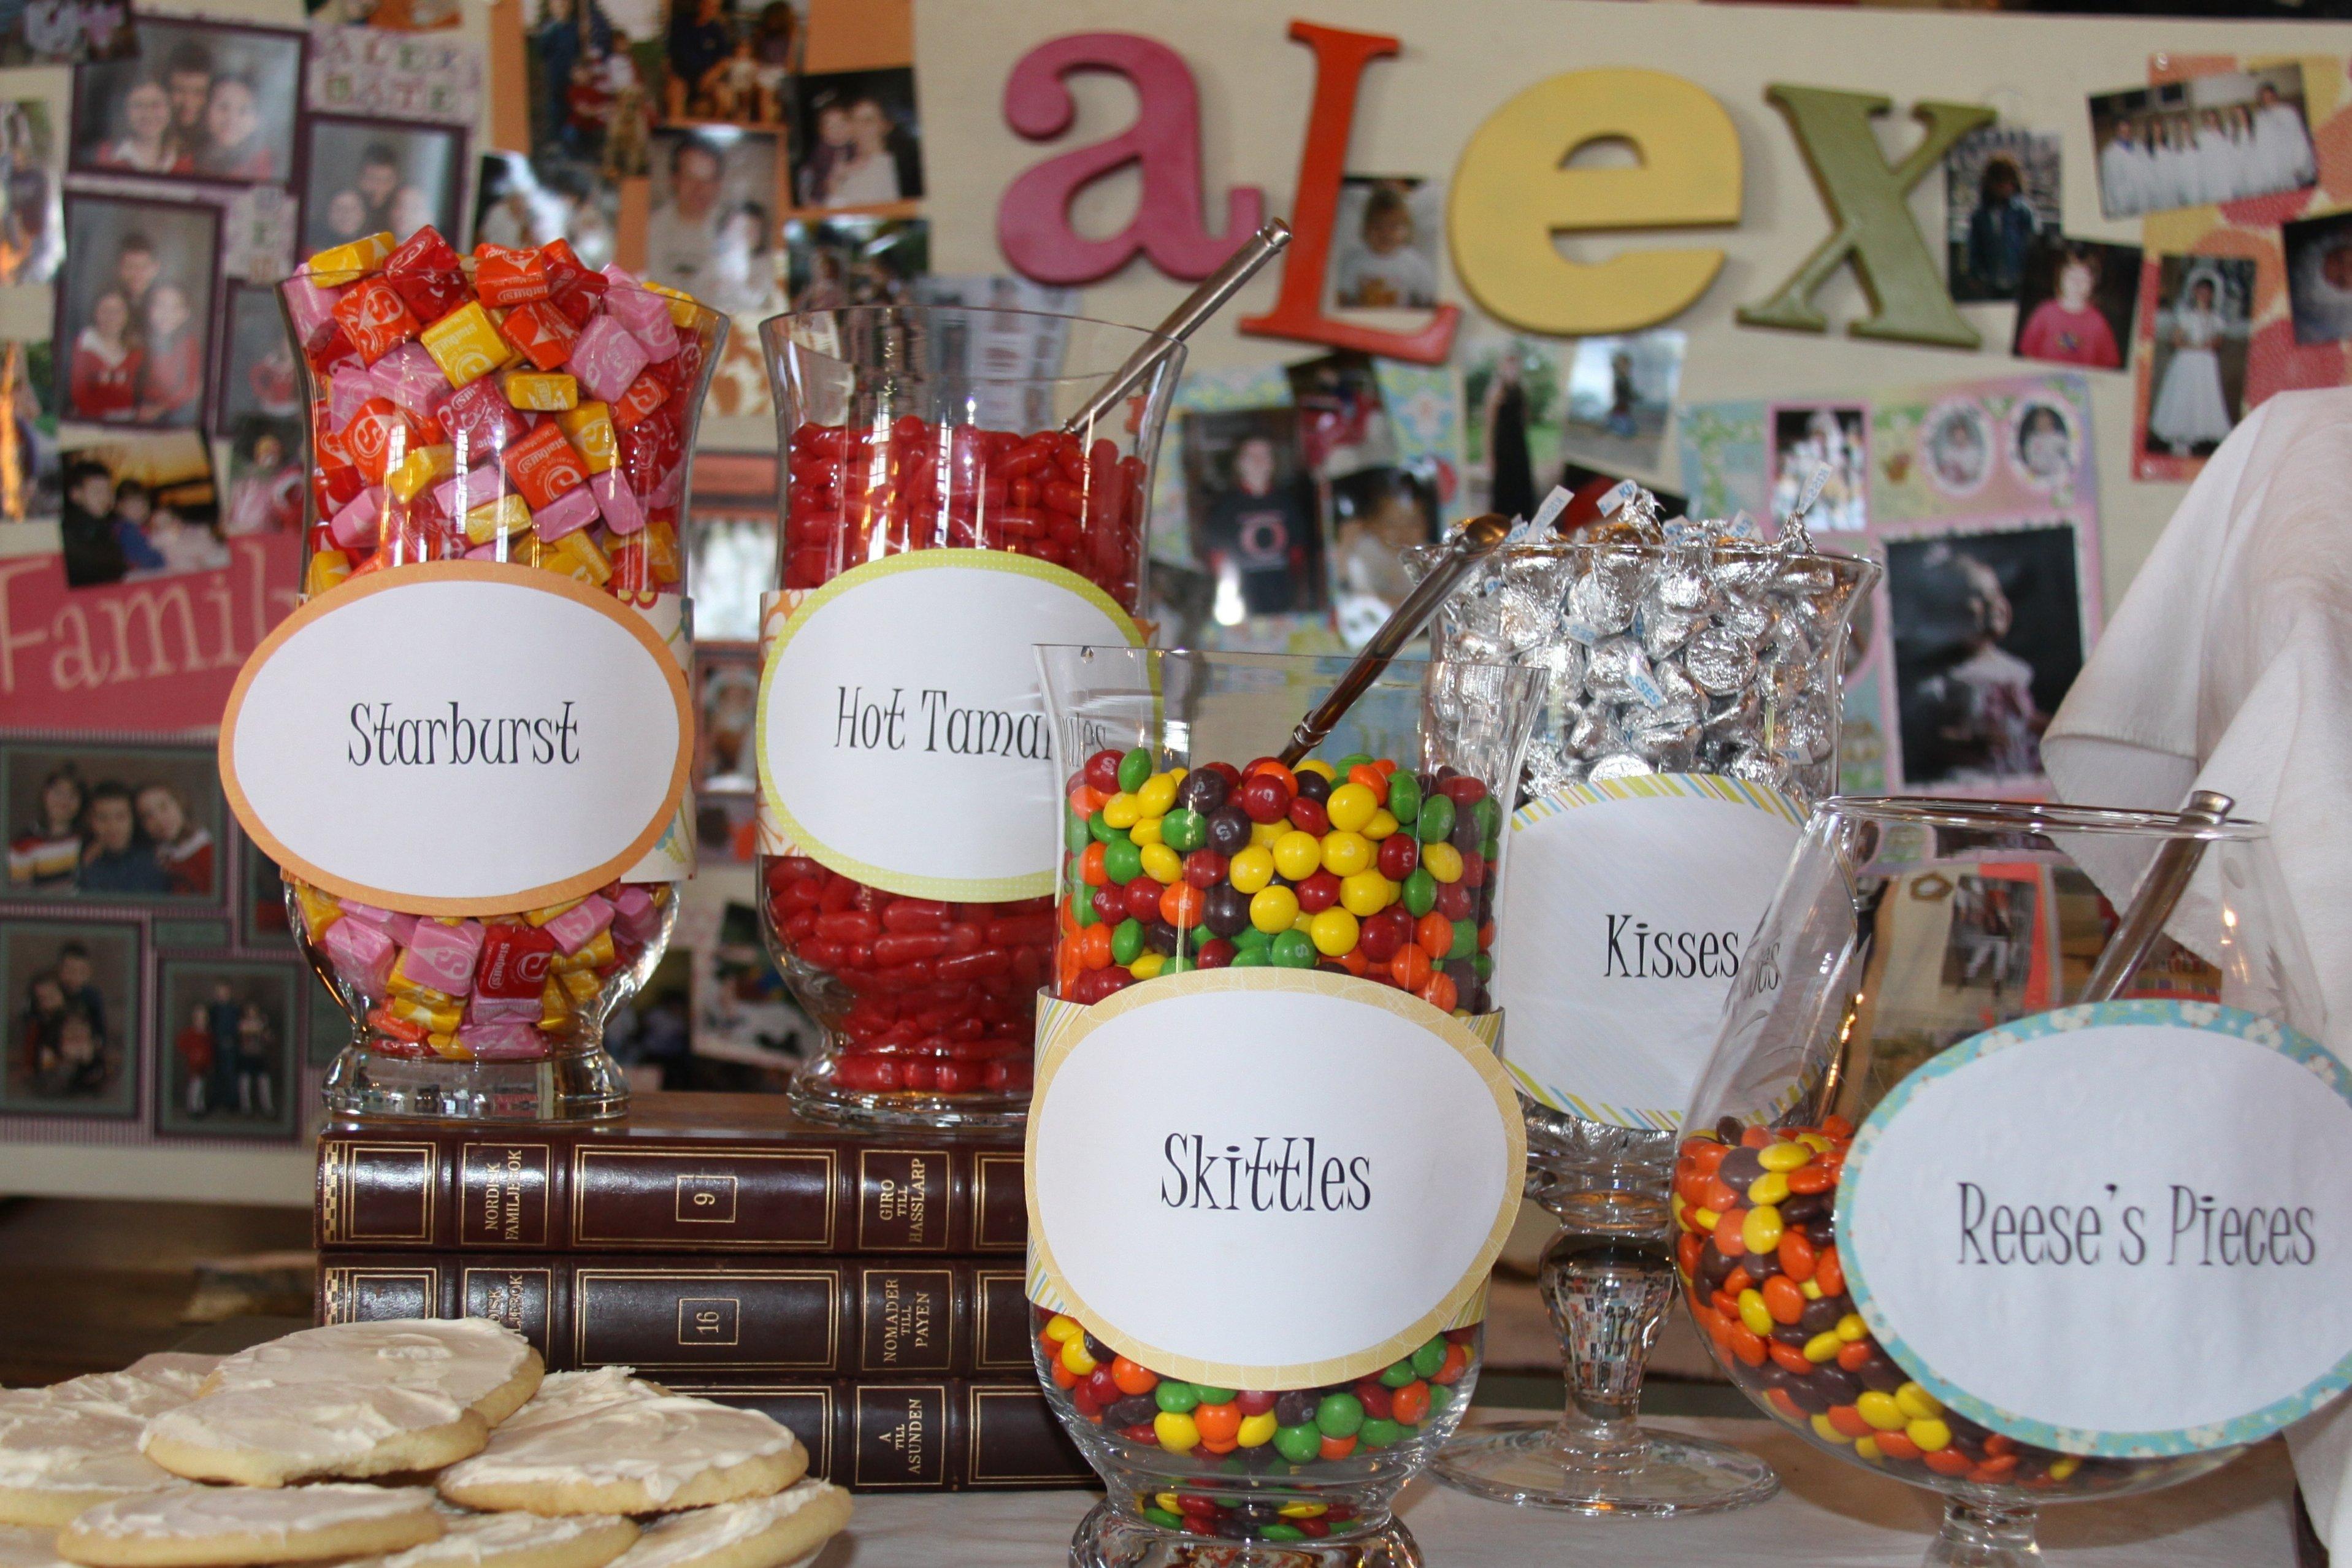 10 Fabulous Food Ideas For Graduation Party high school graduation party ideas graduation party food ideas 1